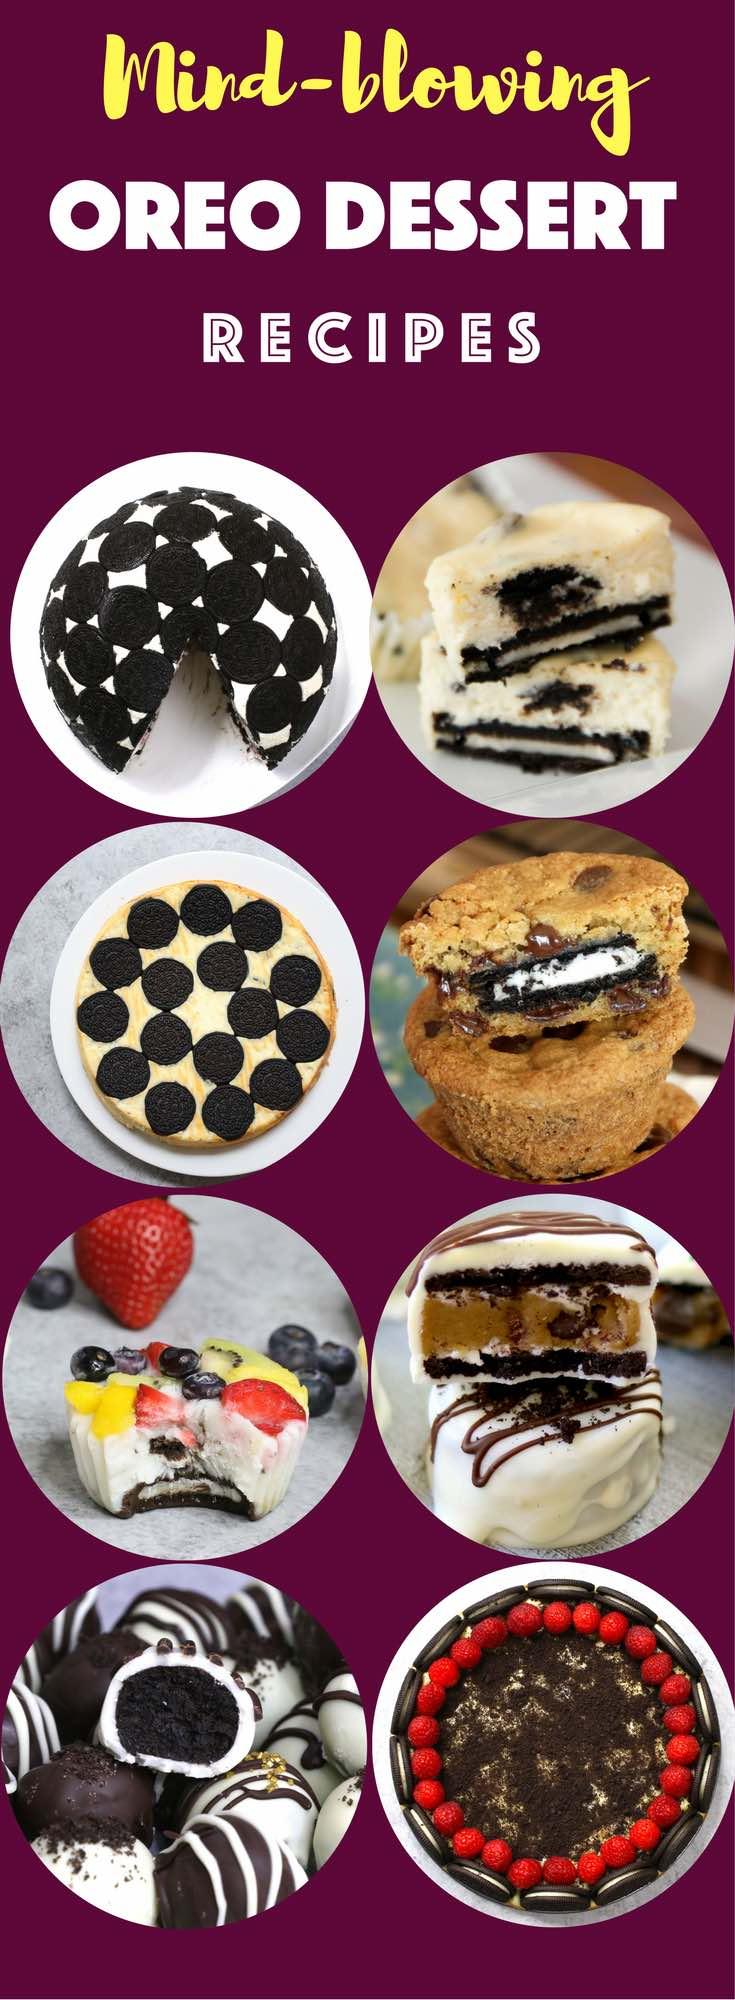 The Best Oreo Dessert Recipes